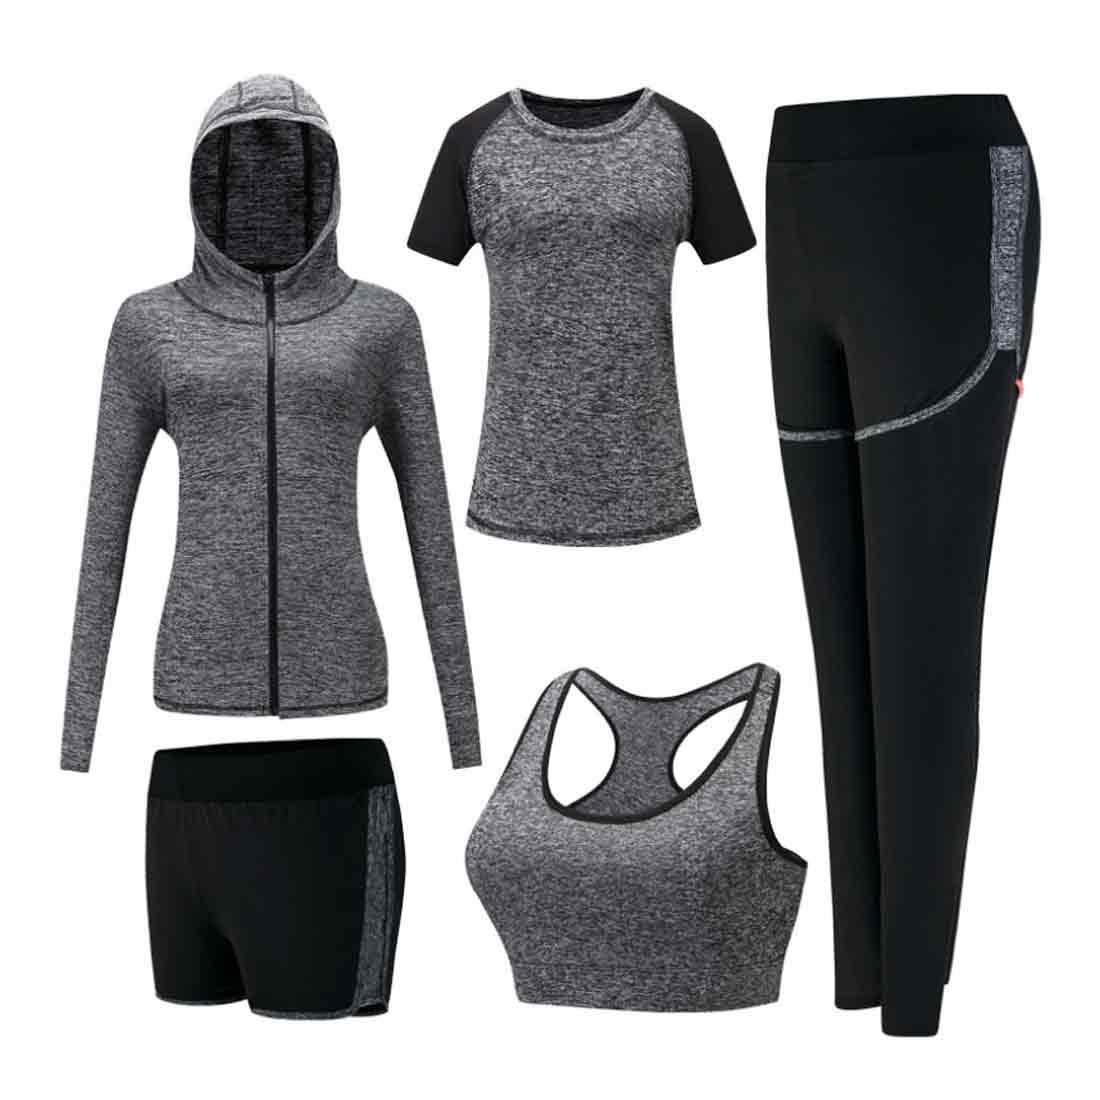 Yoga Sport Durable Portable Diapo Fitness Pilates Gilet Ligne Abdominale Musculaire Accueil Glisser Le Pied Pad Fitness Diaporama